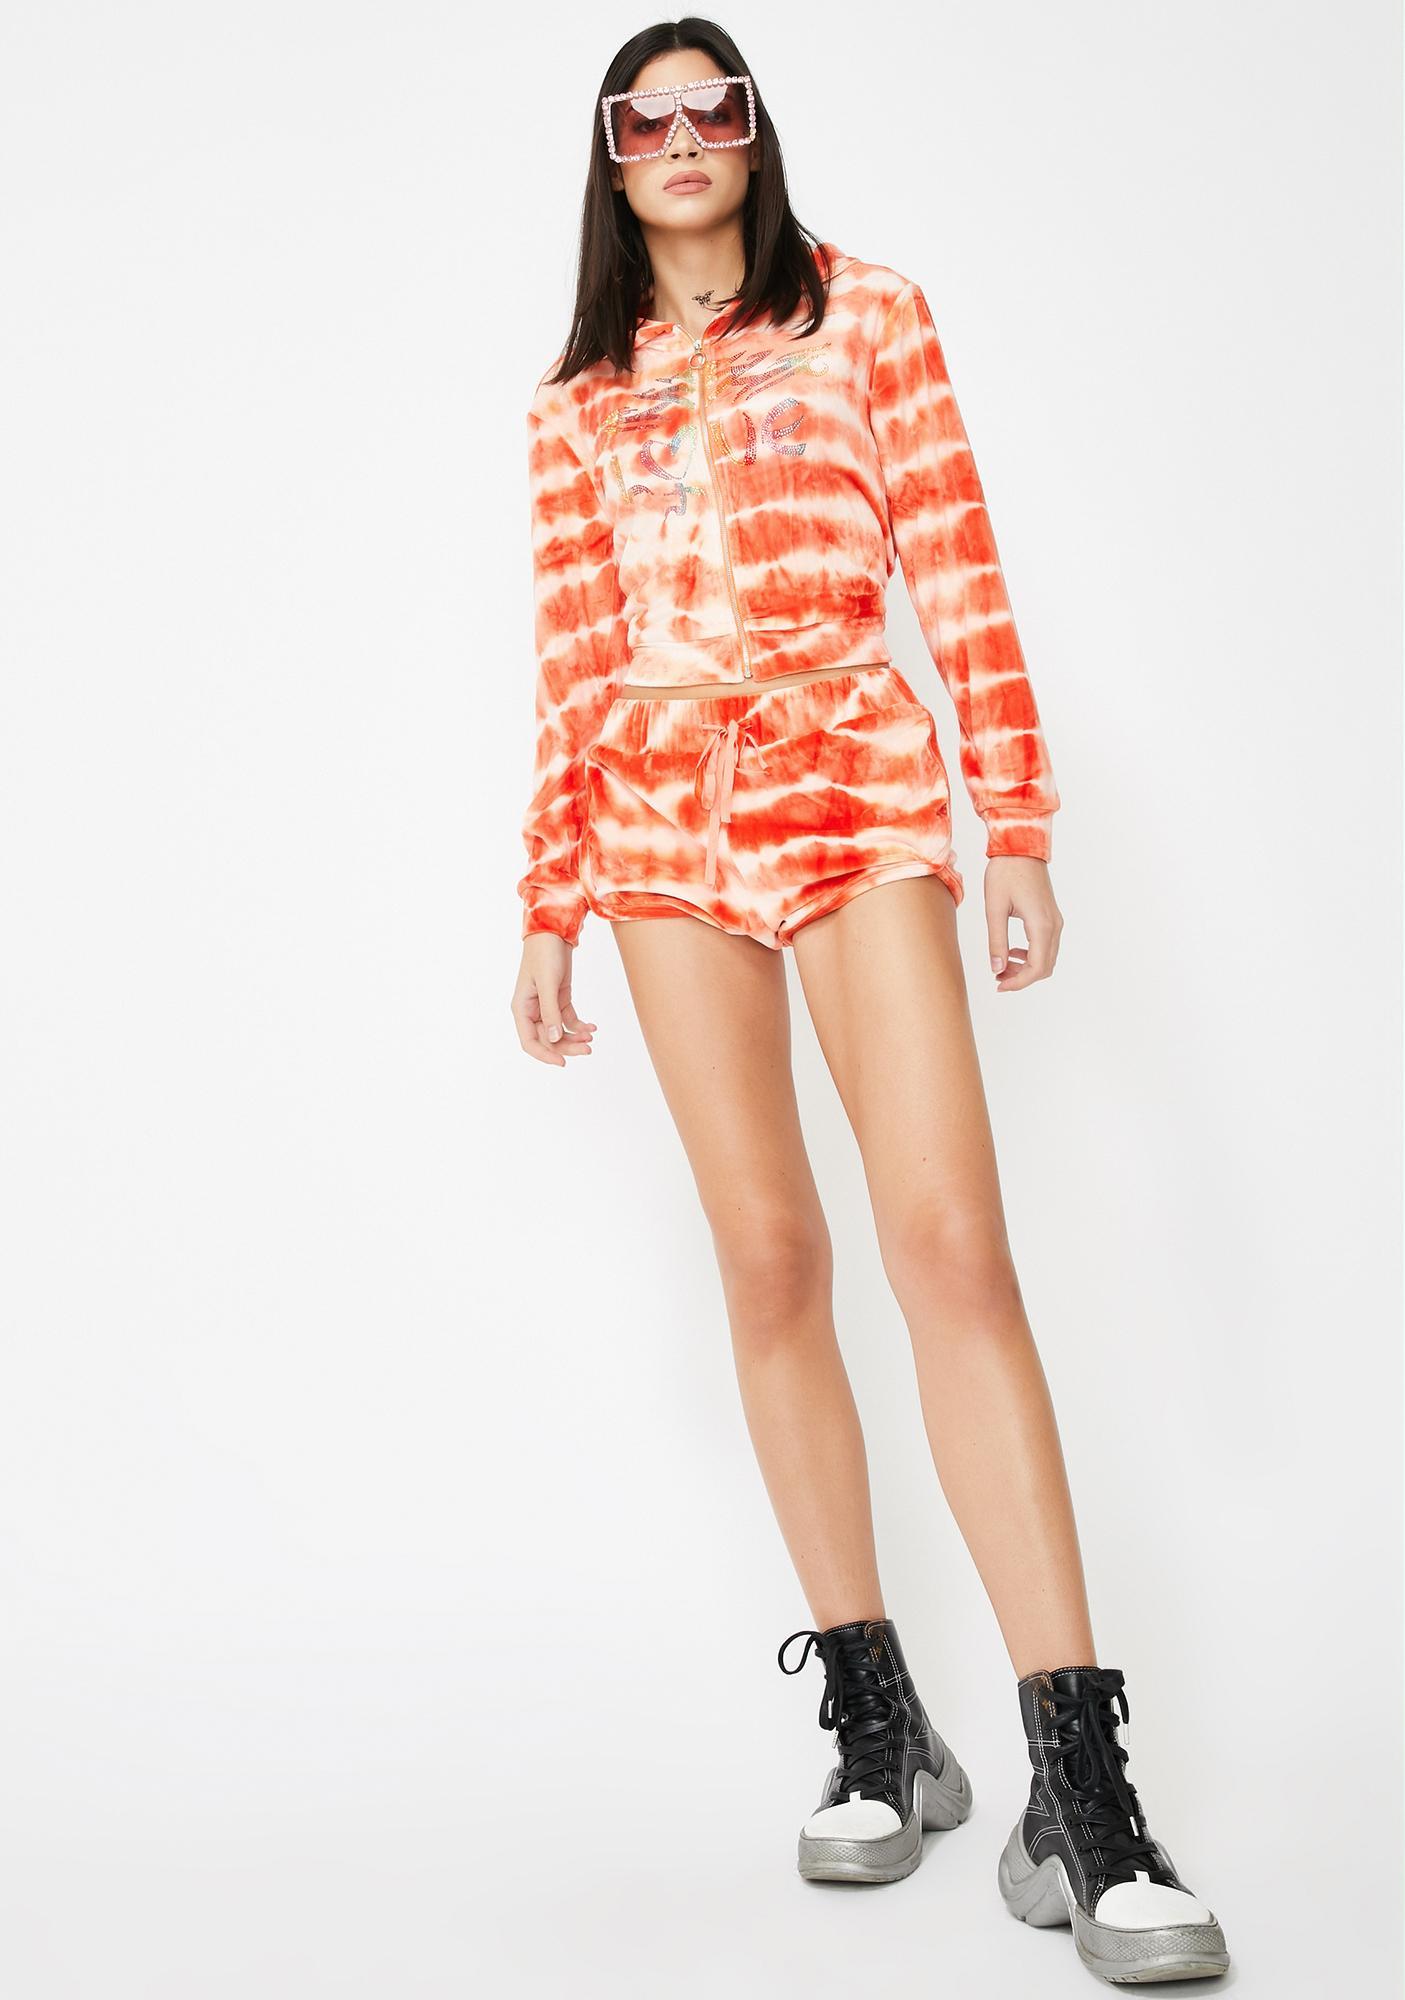 Jaded London Orange Tie Dye Velour Hotpants With Rainbow Rhinestones